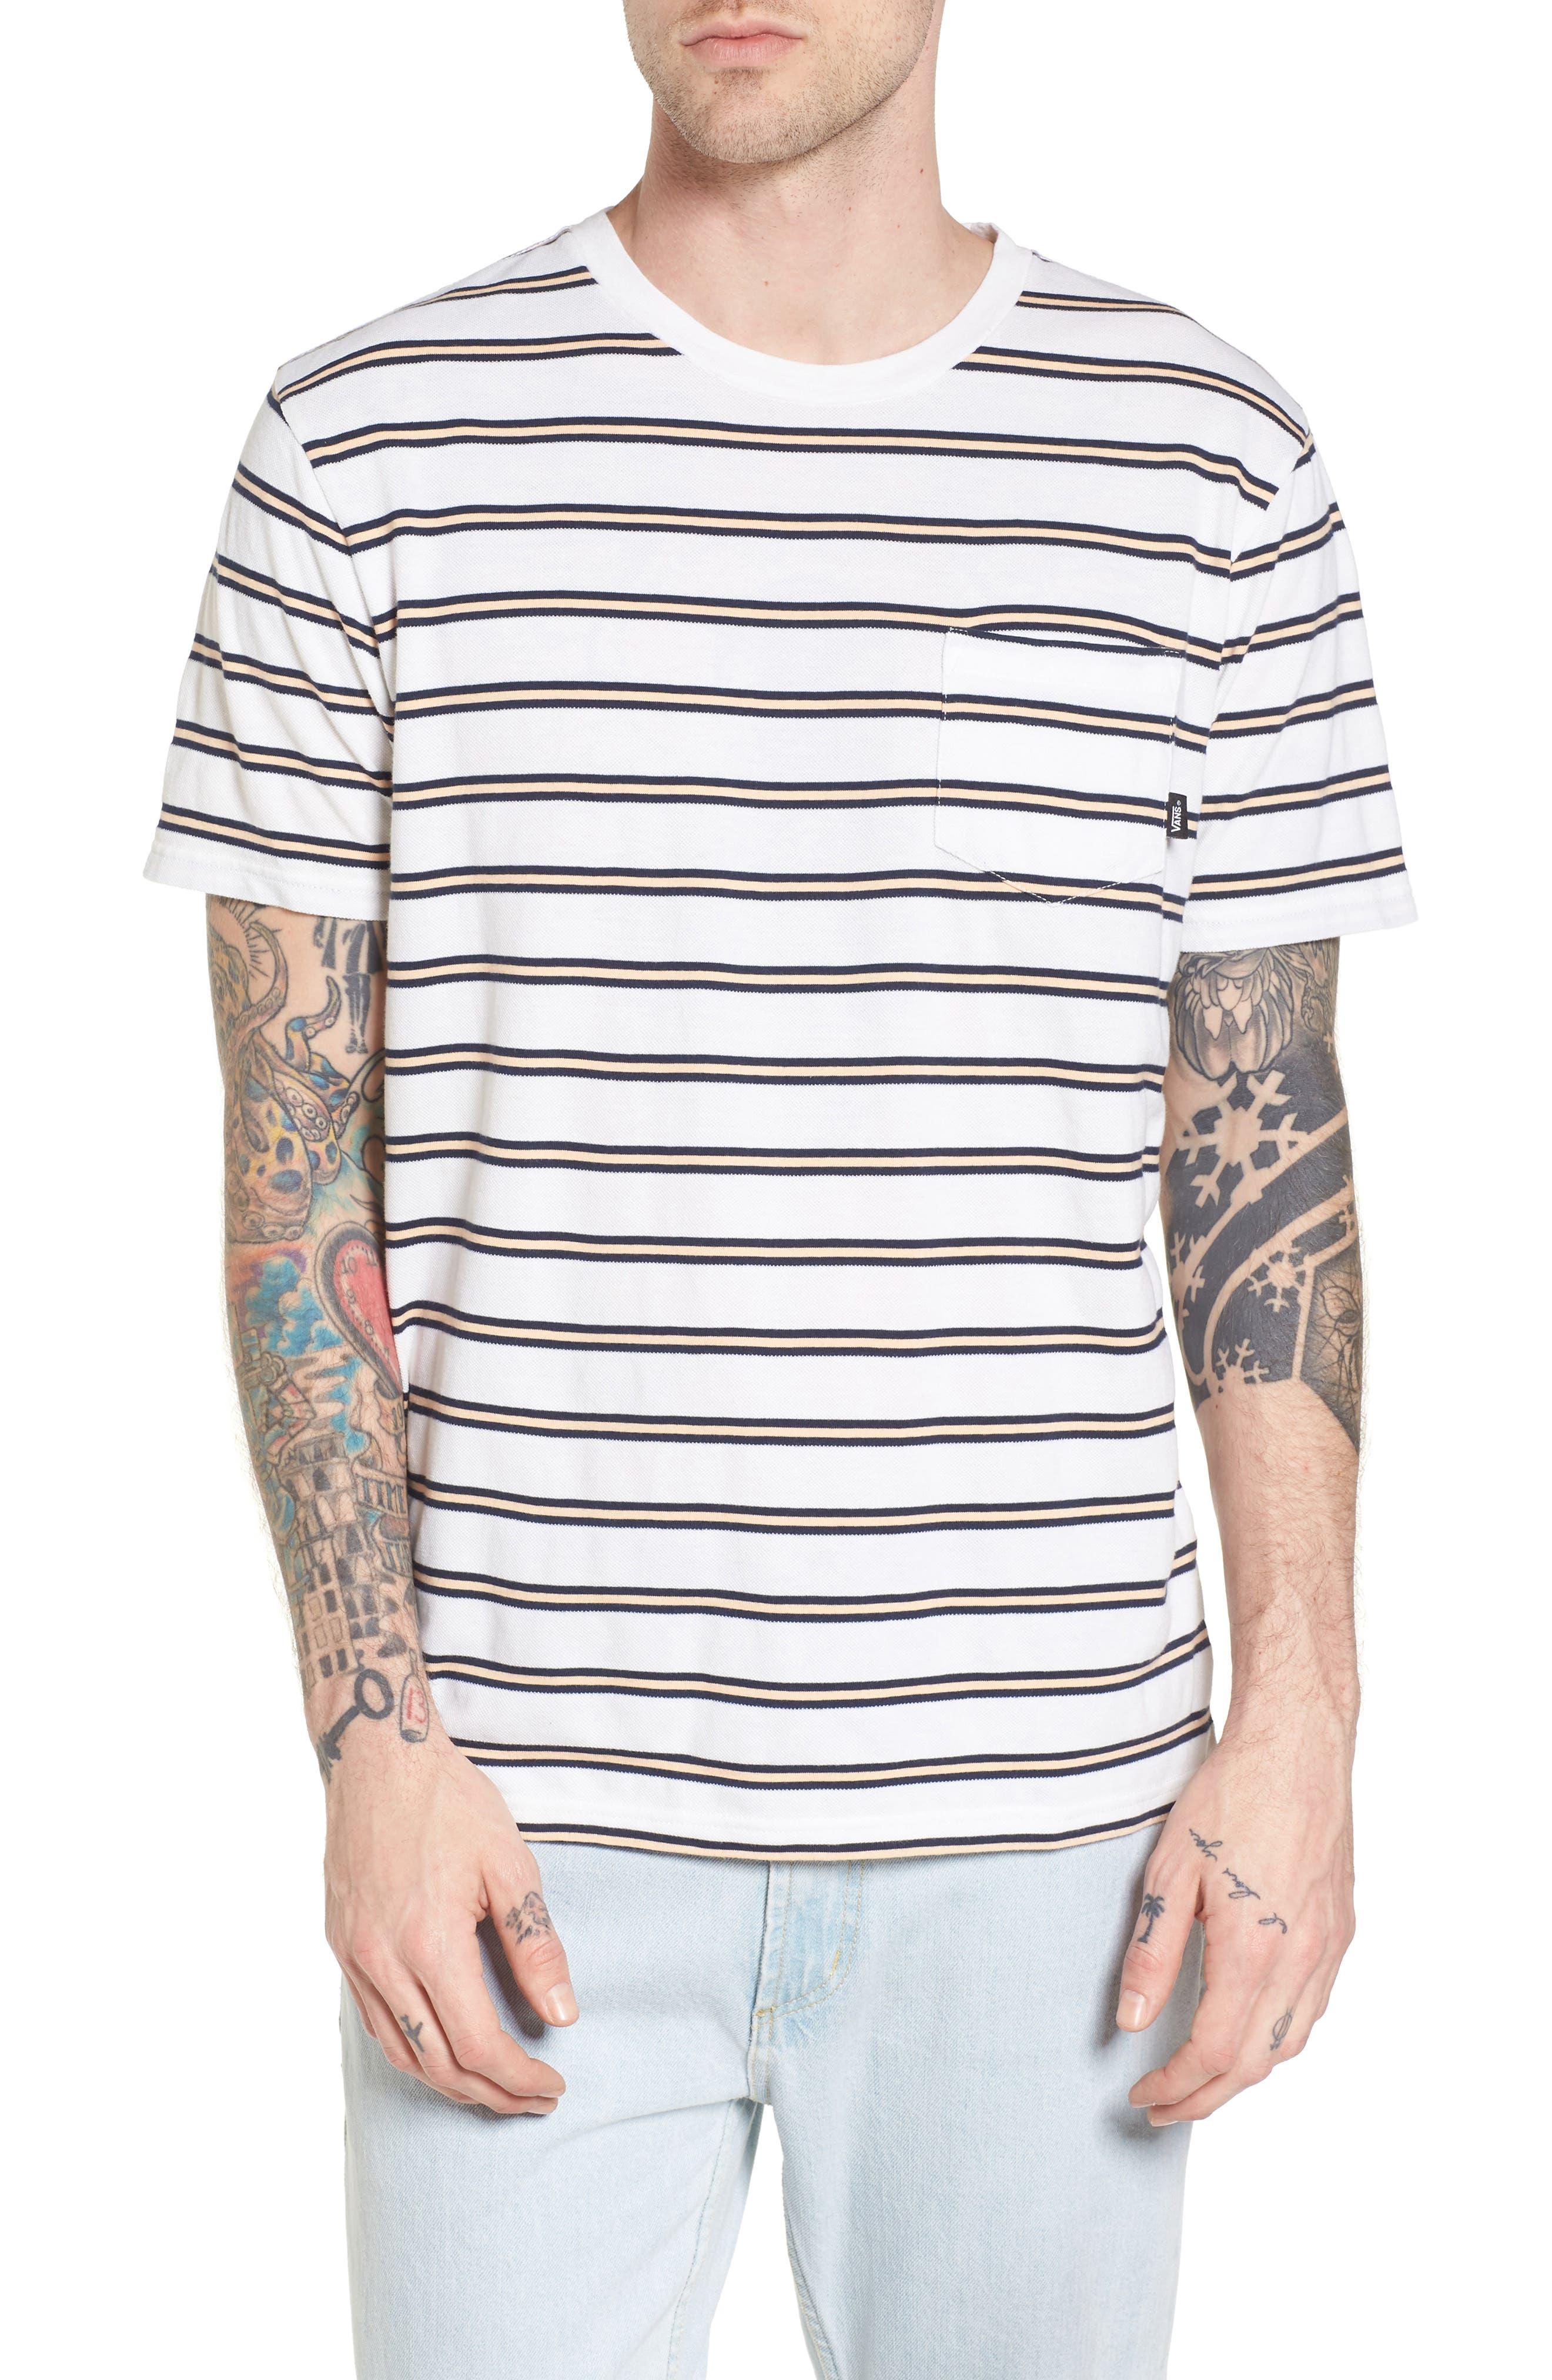 Whittier Pocket T-Shirt,                             Main thumbnail 1, color,                             900